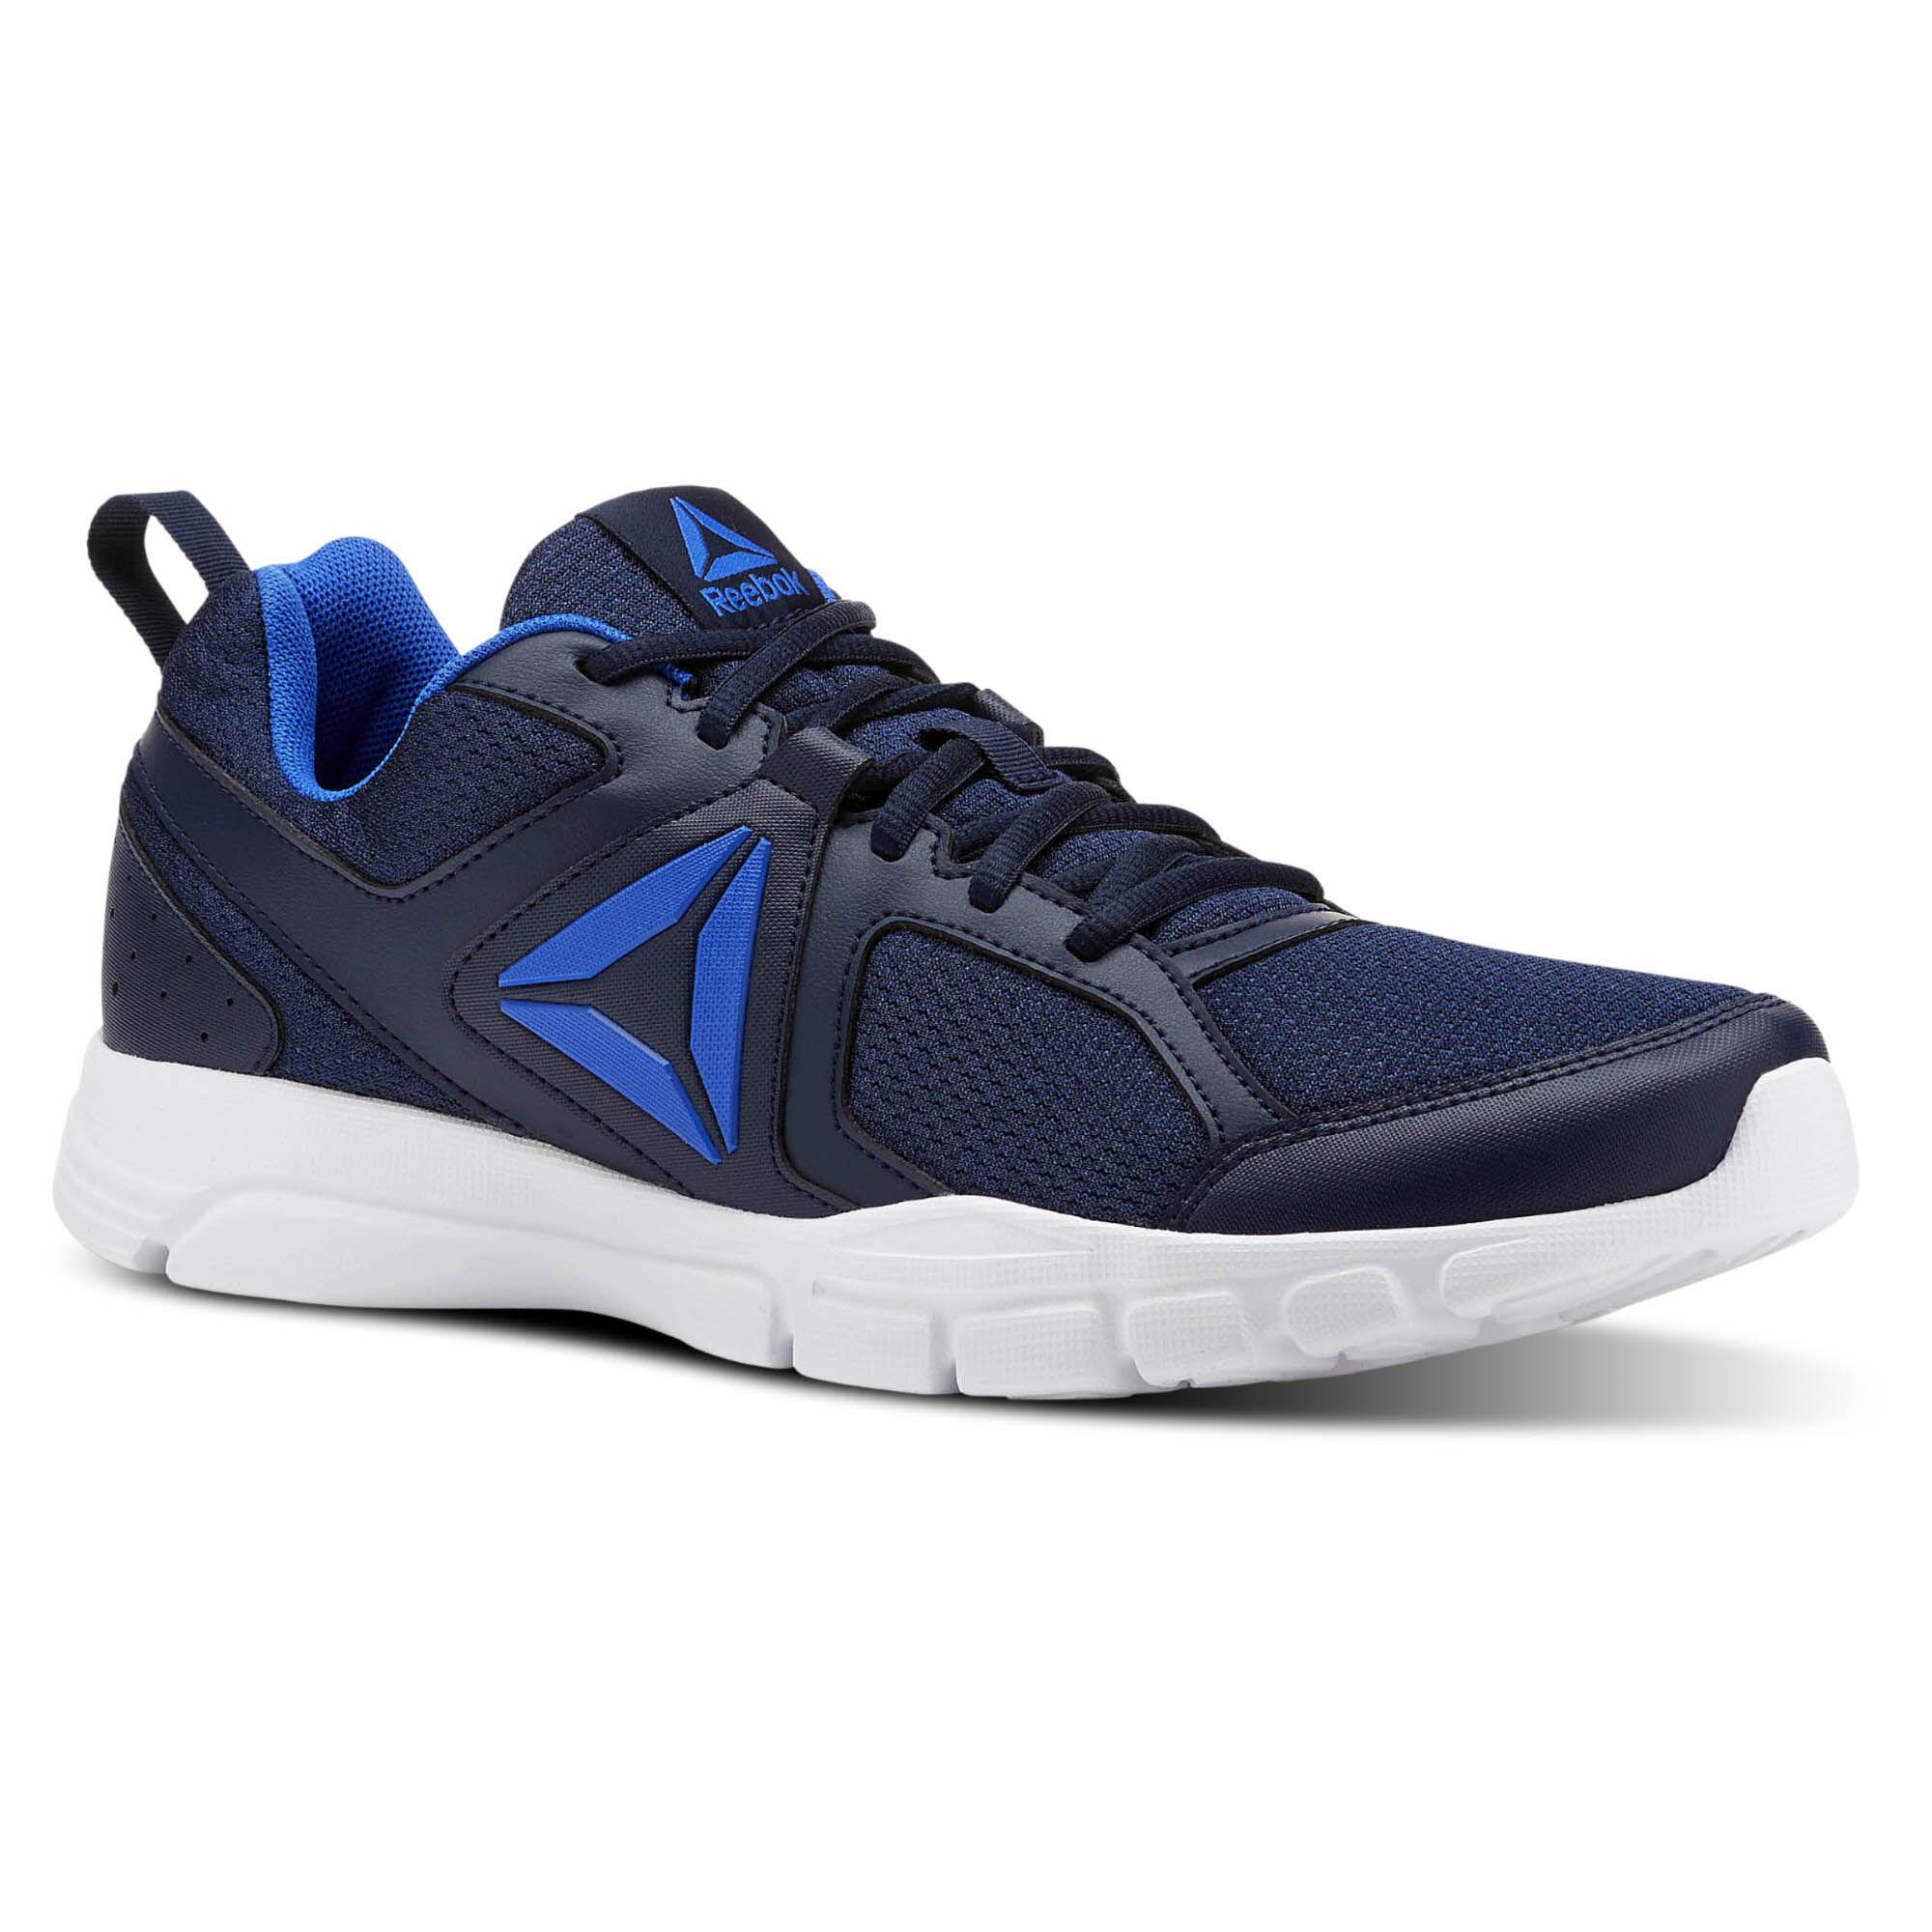 Reebok 3D FUSION TR - Stabilty running shoes - blue XMrTDBQ1s6